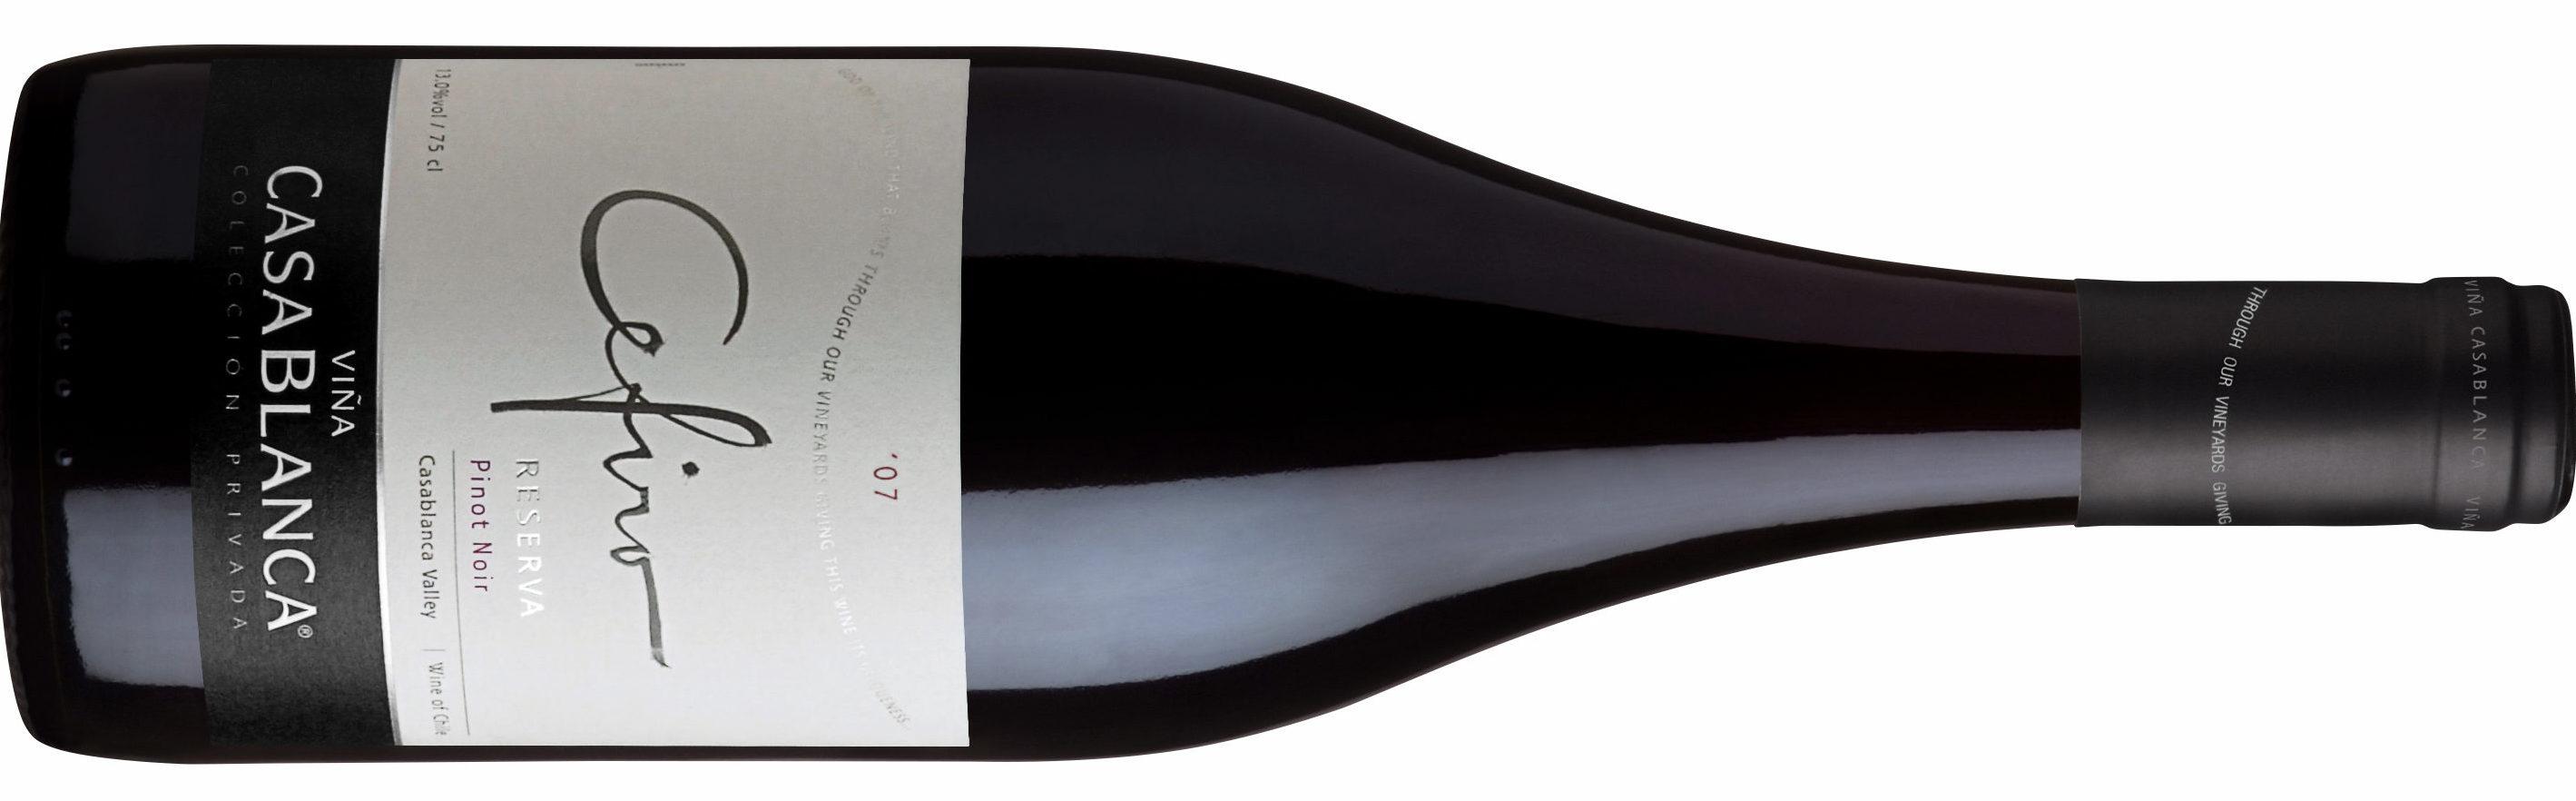 cefiro-reserva-pinot-noir